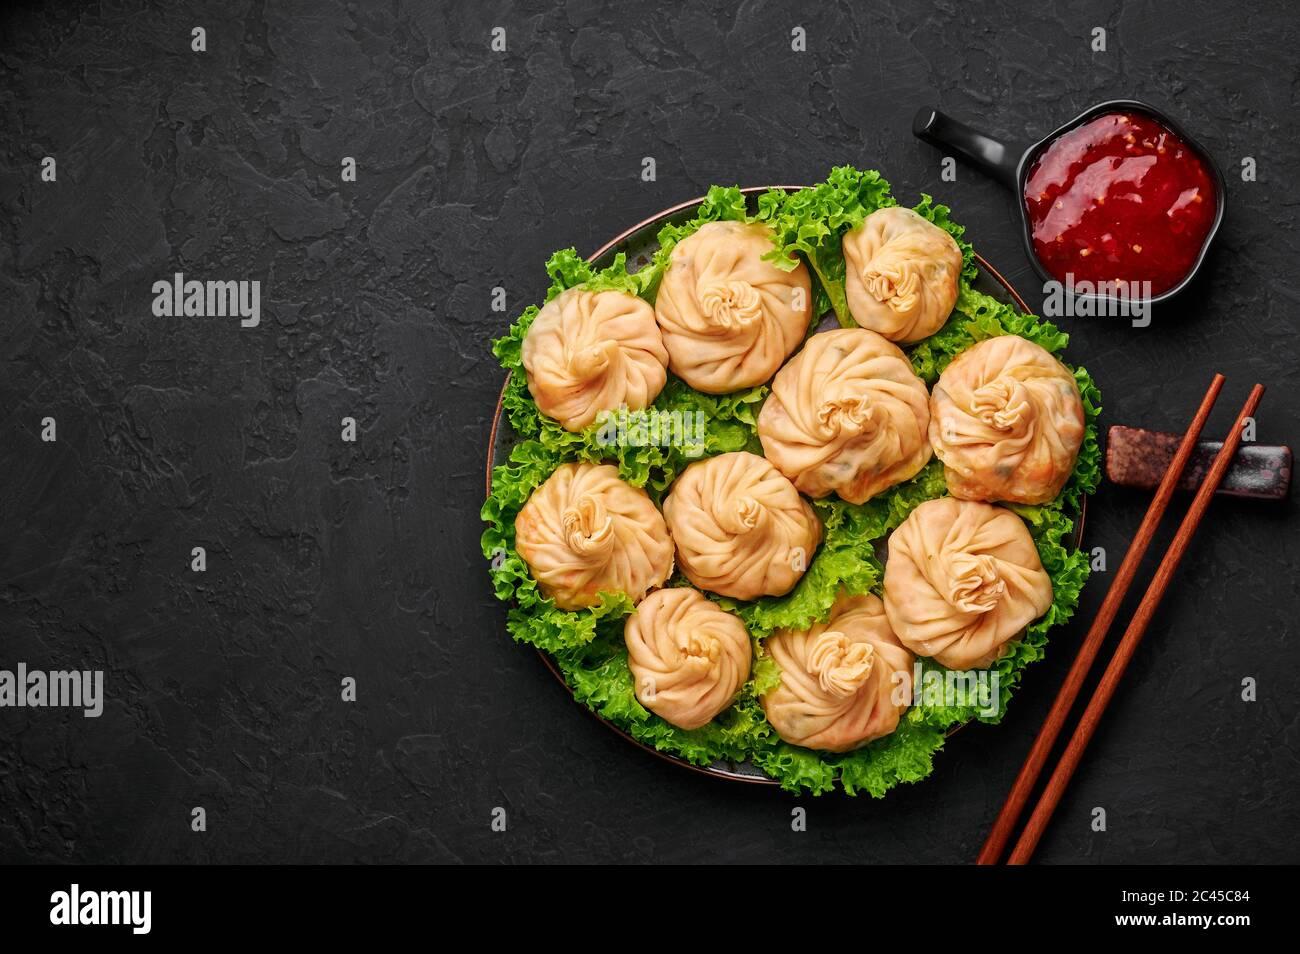 Veg Momos sobre pizarra negra mesa. Momos es el plato popular de la cocina india, tibetana, china. Comida asiática. Comida vegetariana. Espacio de copia. Vista superior Foto de stock